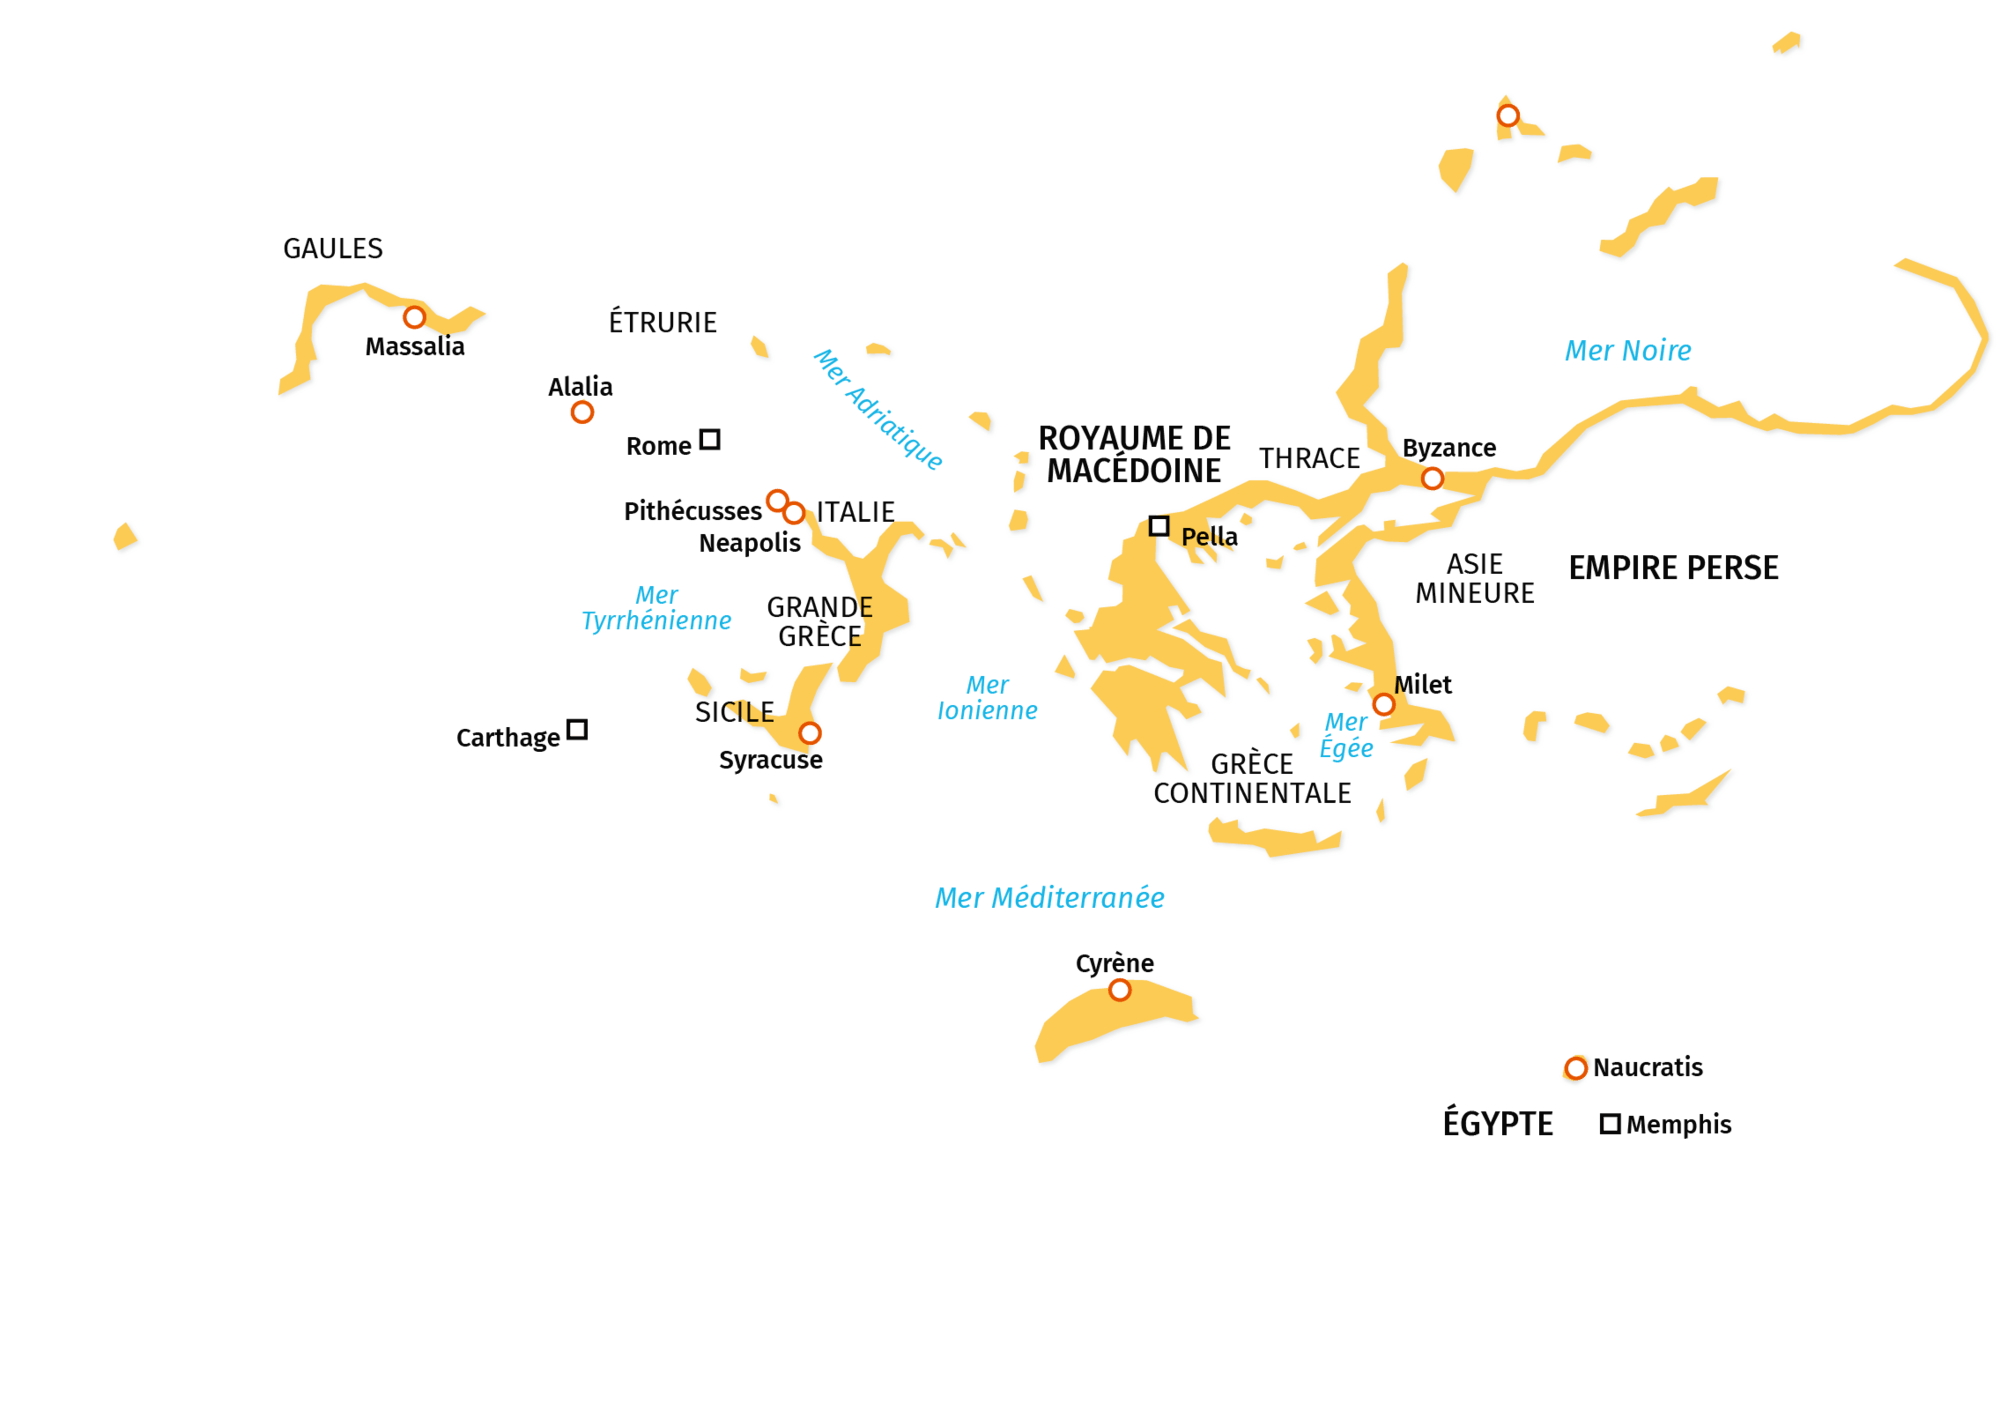 I. Une Méditerranée grecque